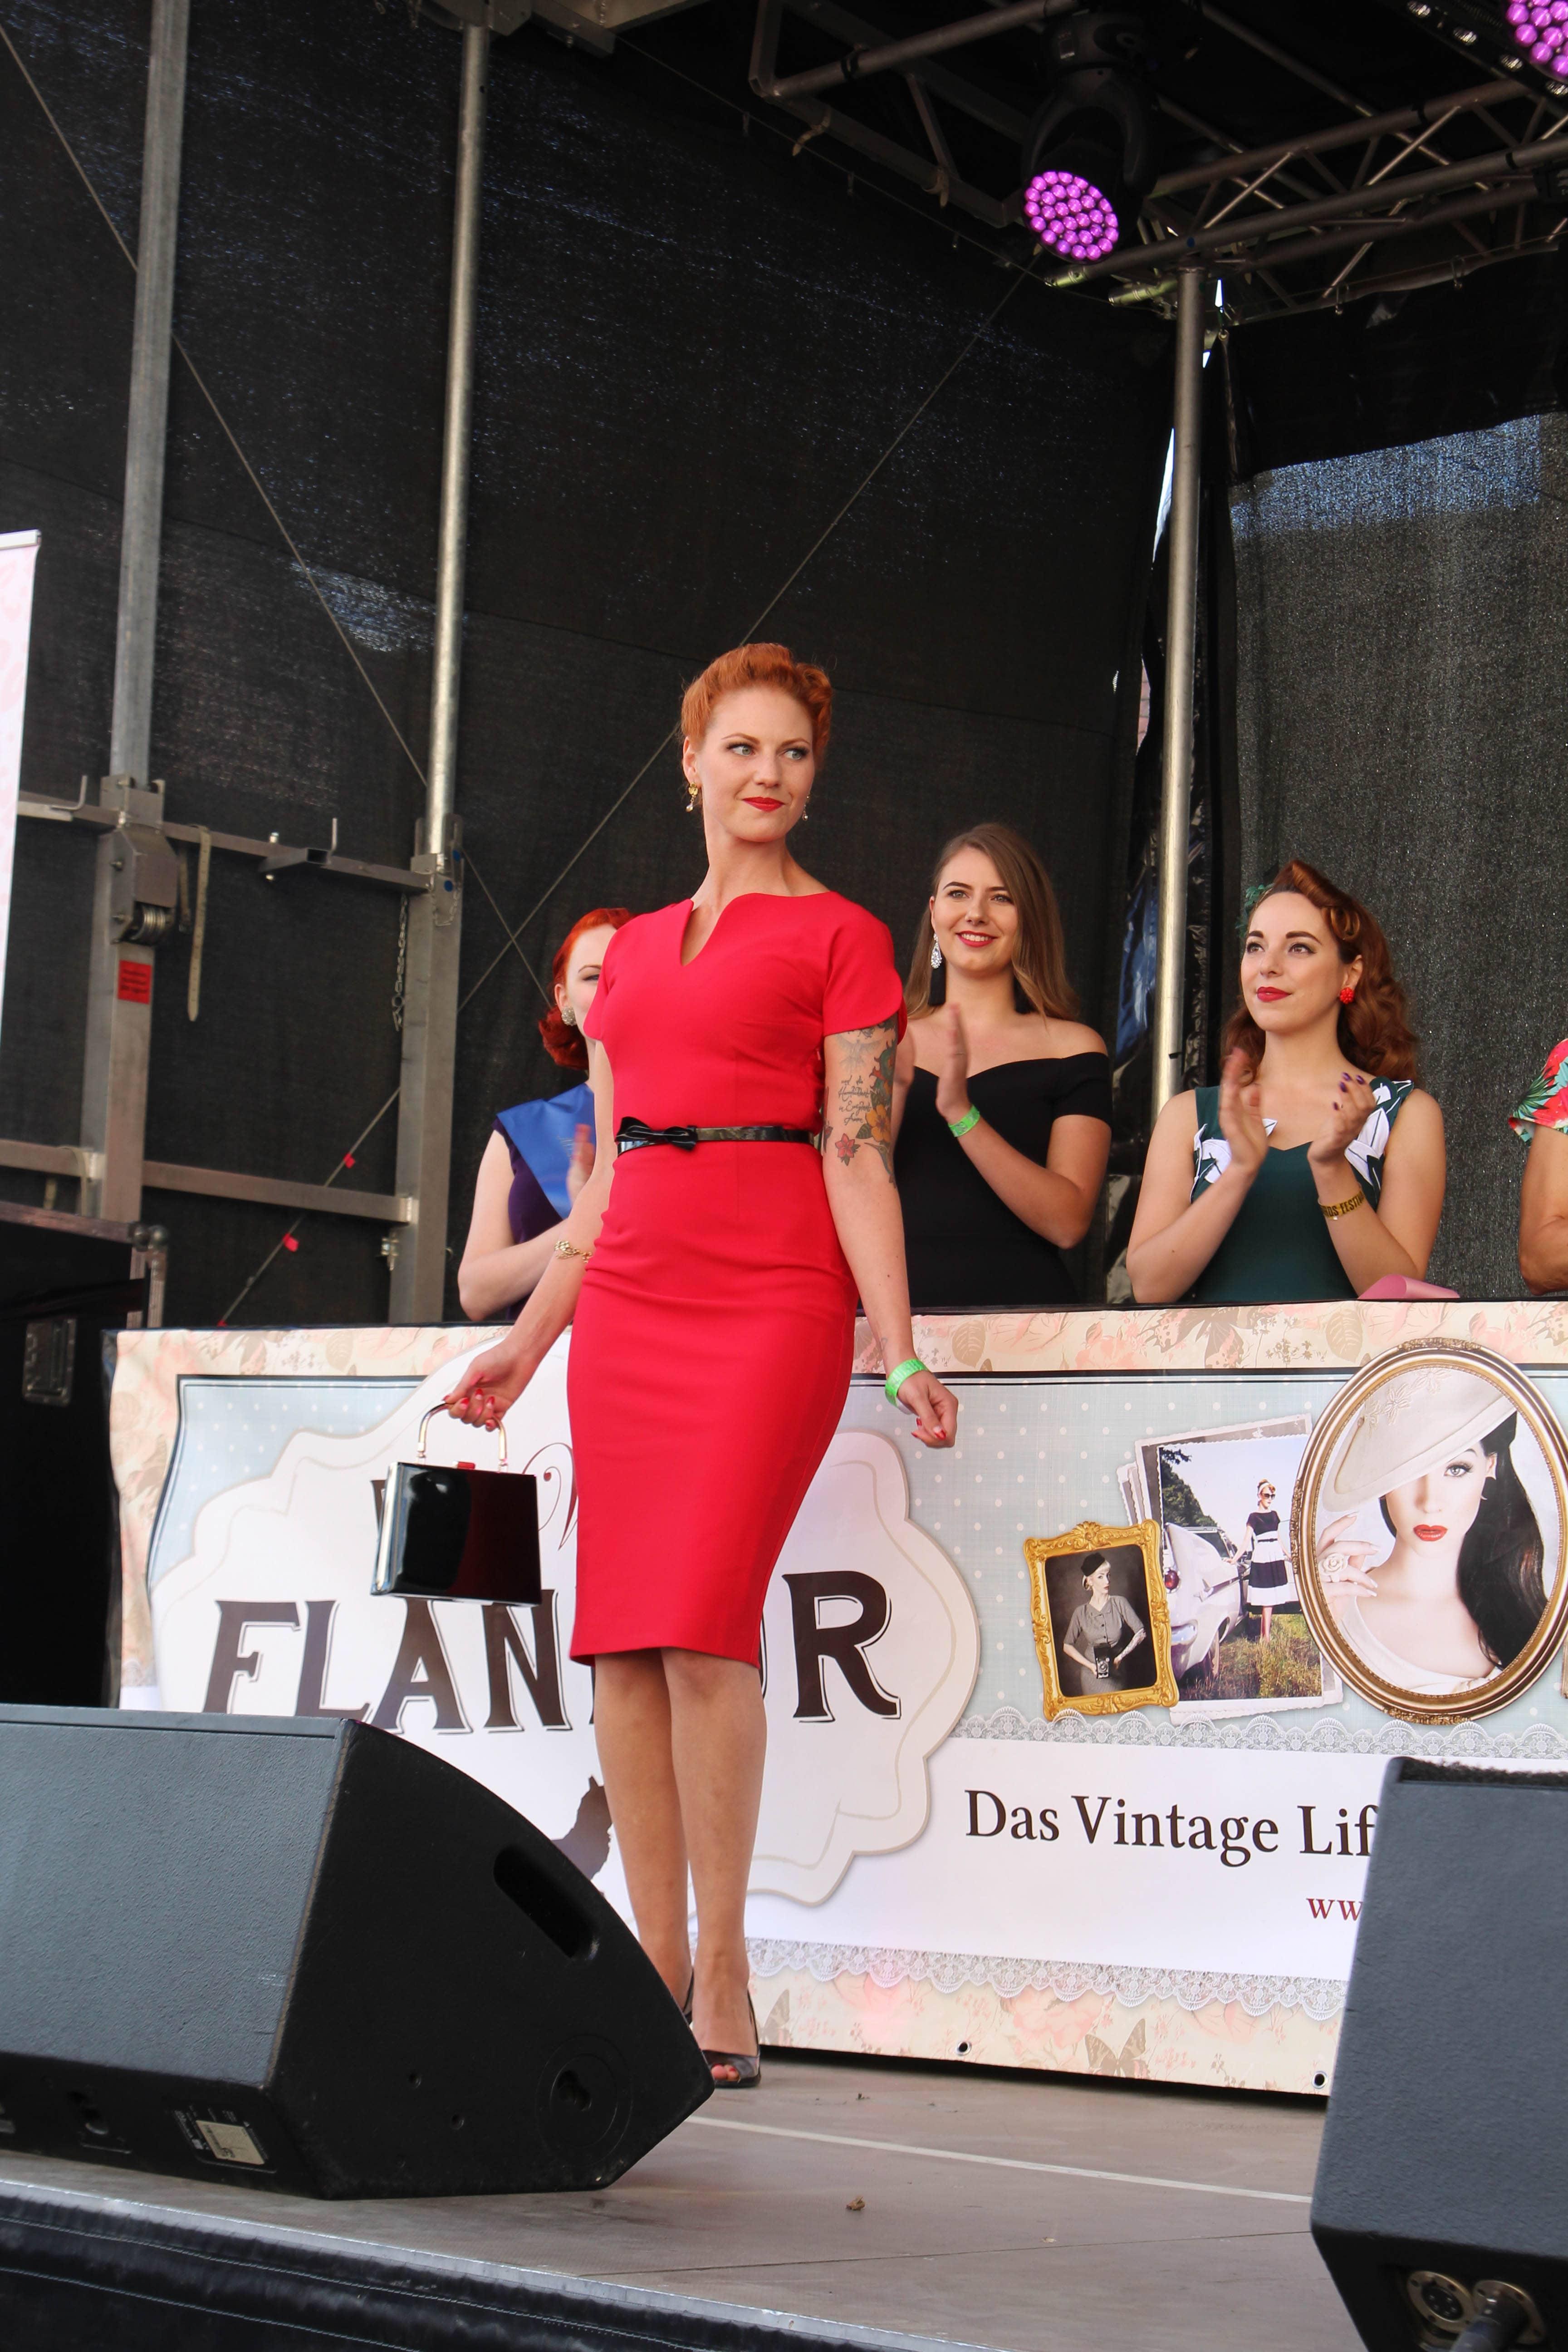 Eva van Hoven sieht umwerfend aus in feurigem Rot